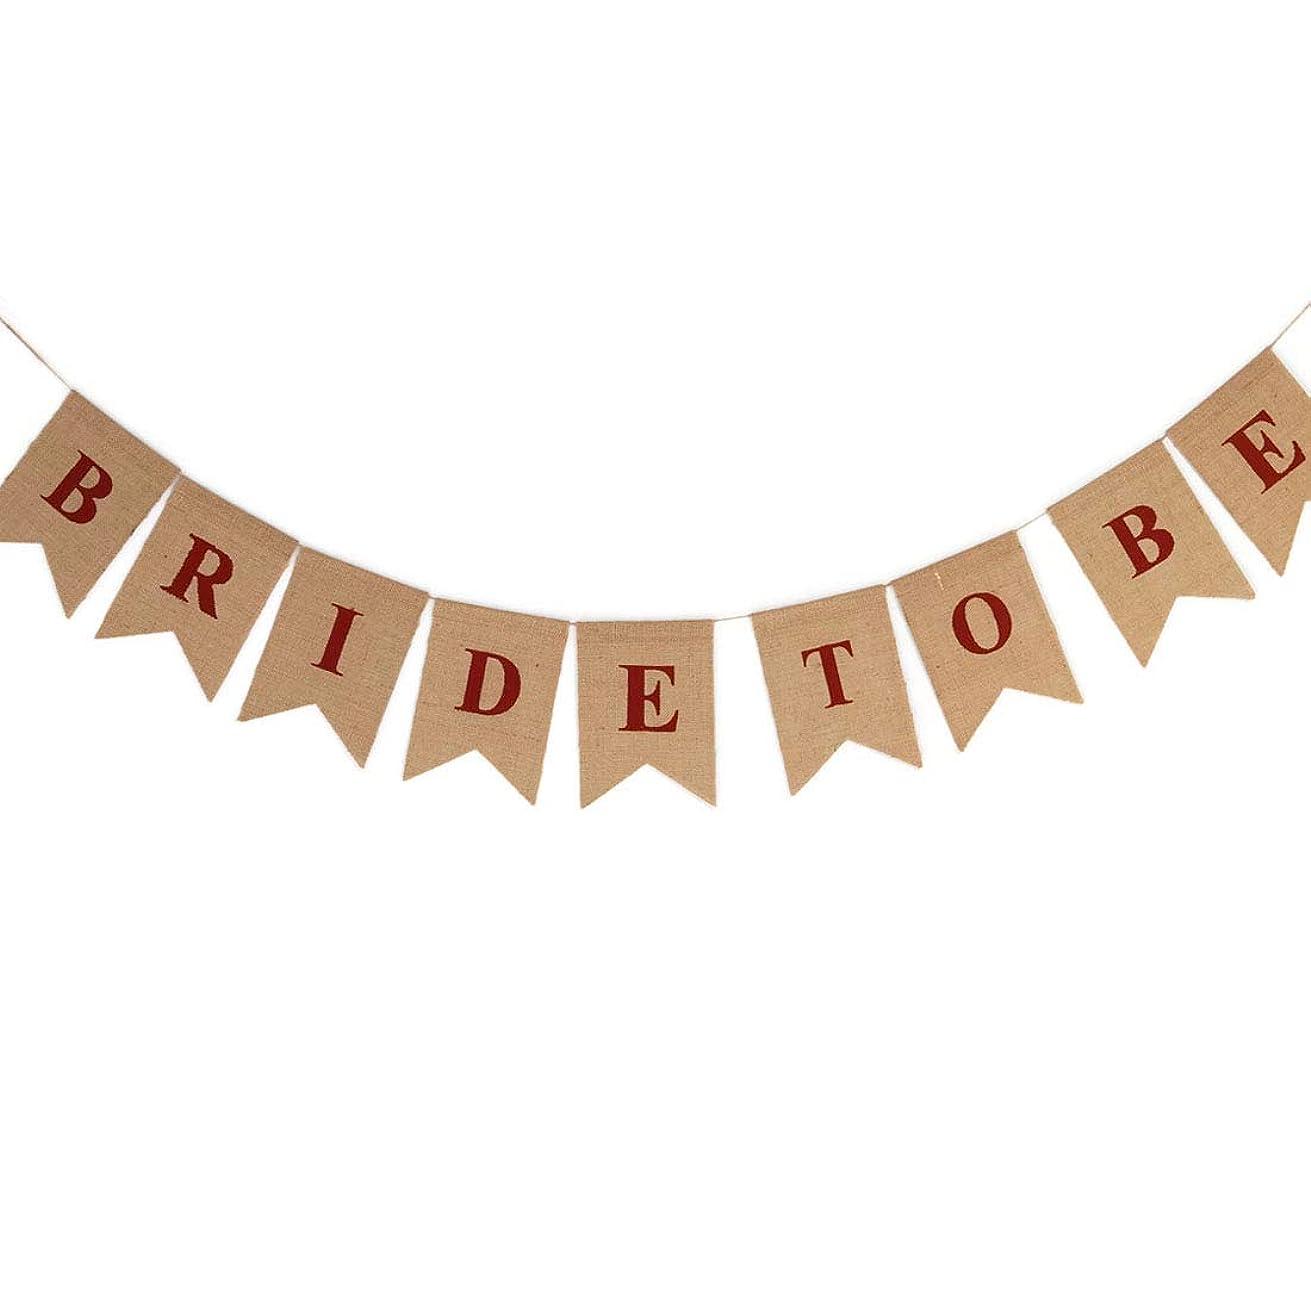 Boston Creative company Bride to Be Burlap - Weddin Decoration Flag Banner - Bridal Shower Decor Burlap - Engagement Hens Party Bachelorette - Wedding Engagement Burlap